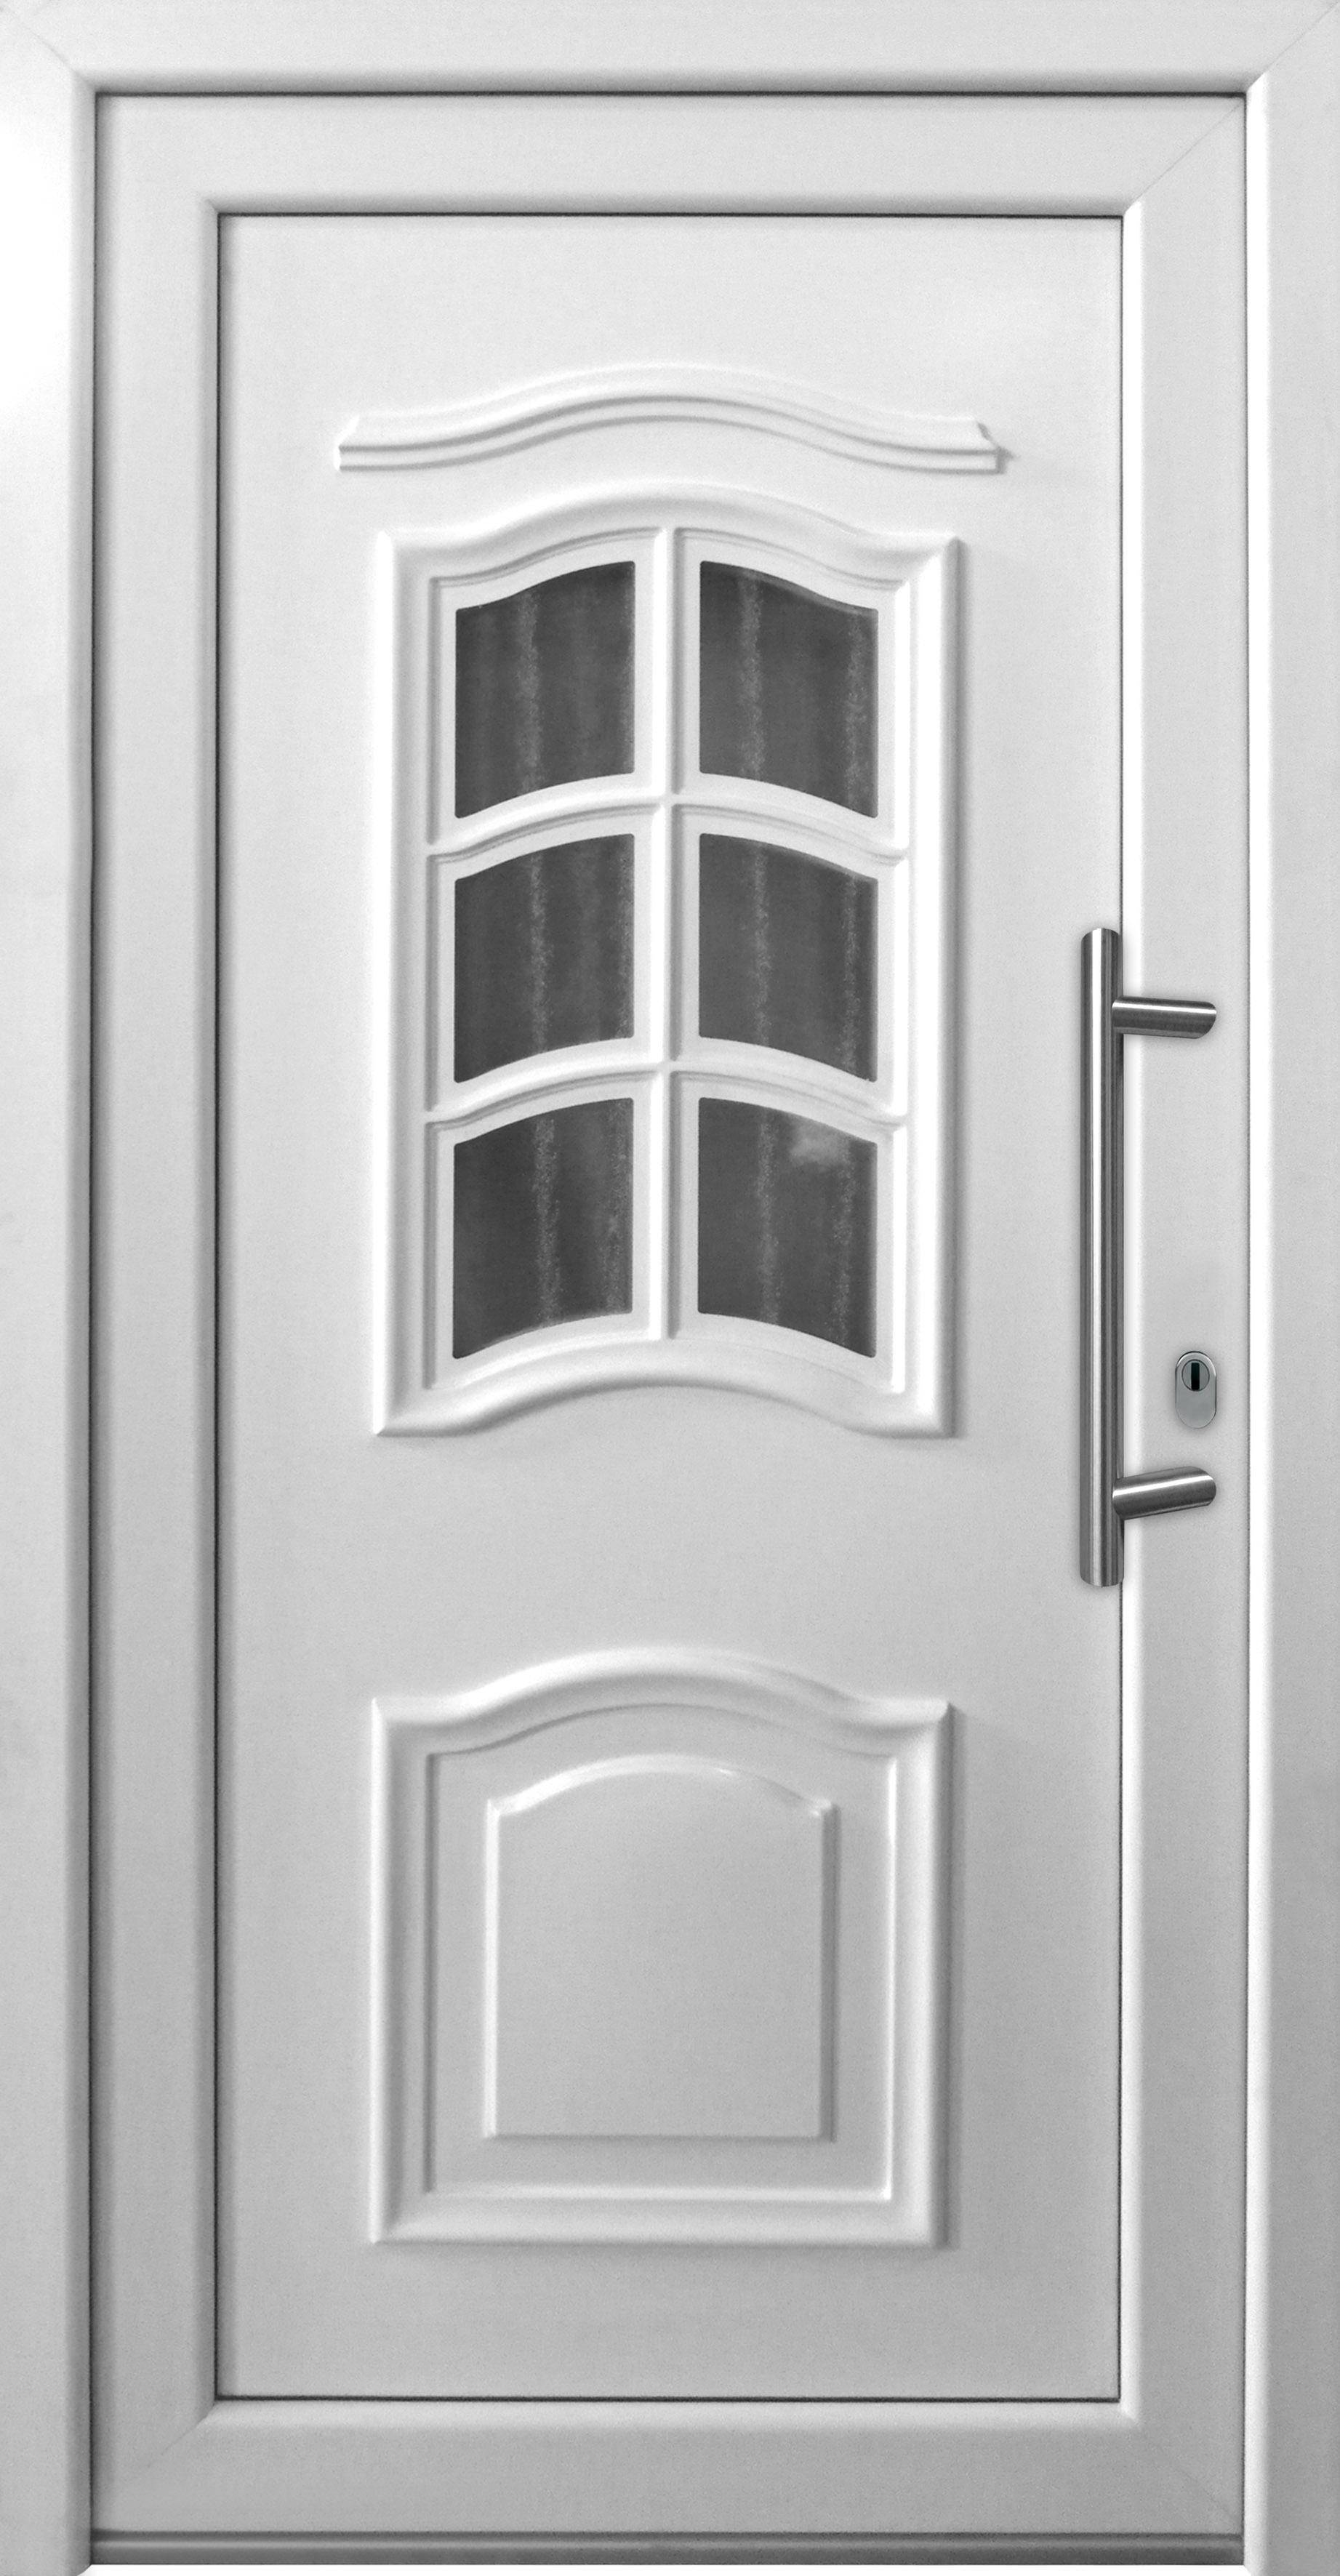 KunststoffHaustür K003  KunststoffHaustüren  KunststoffTüren